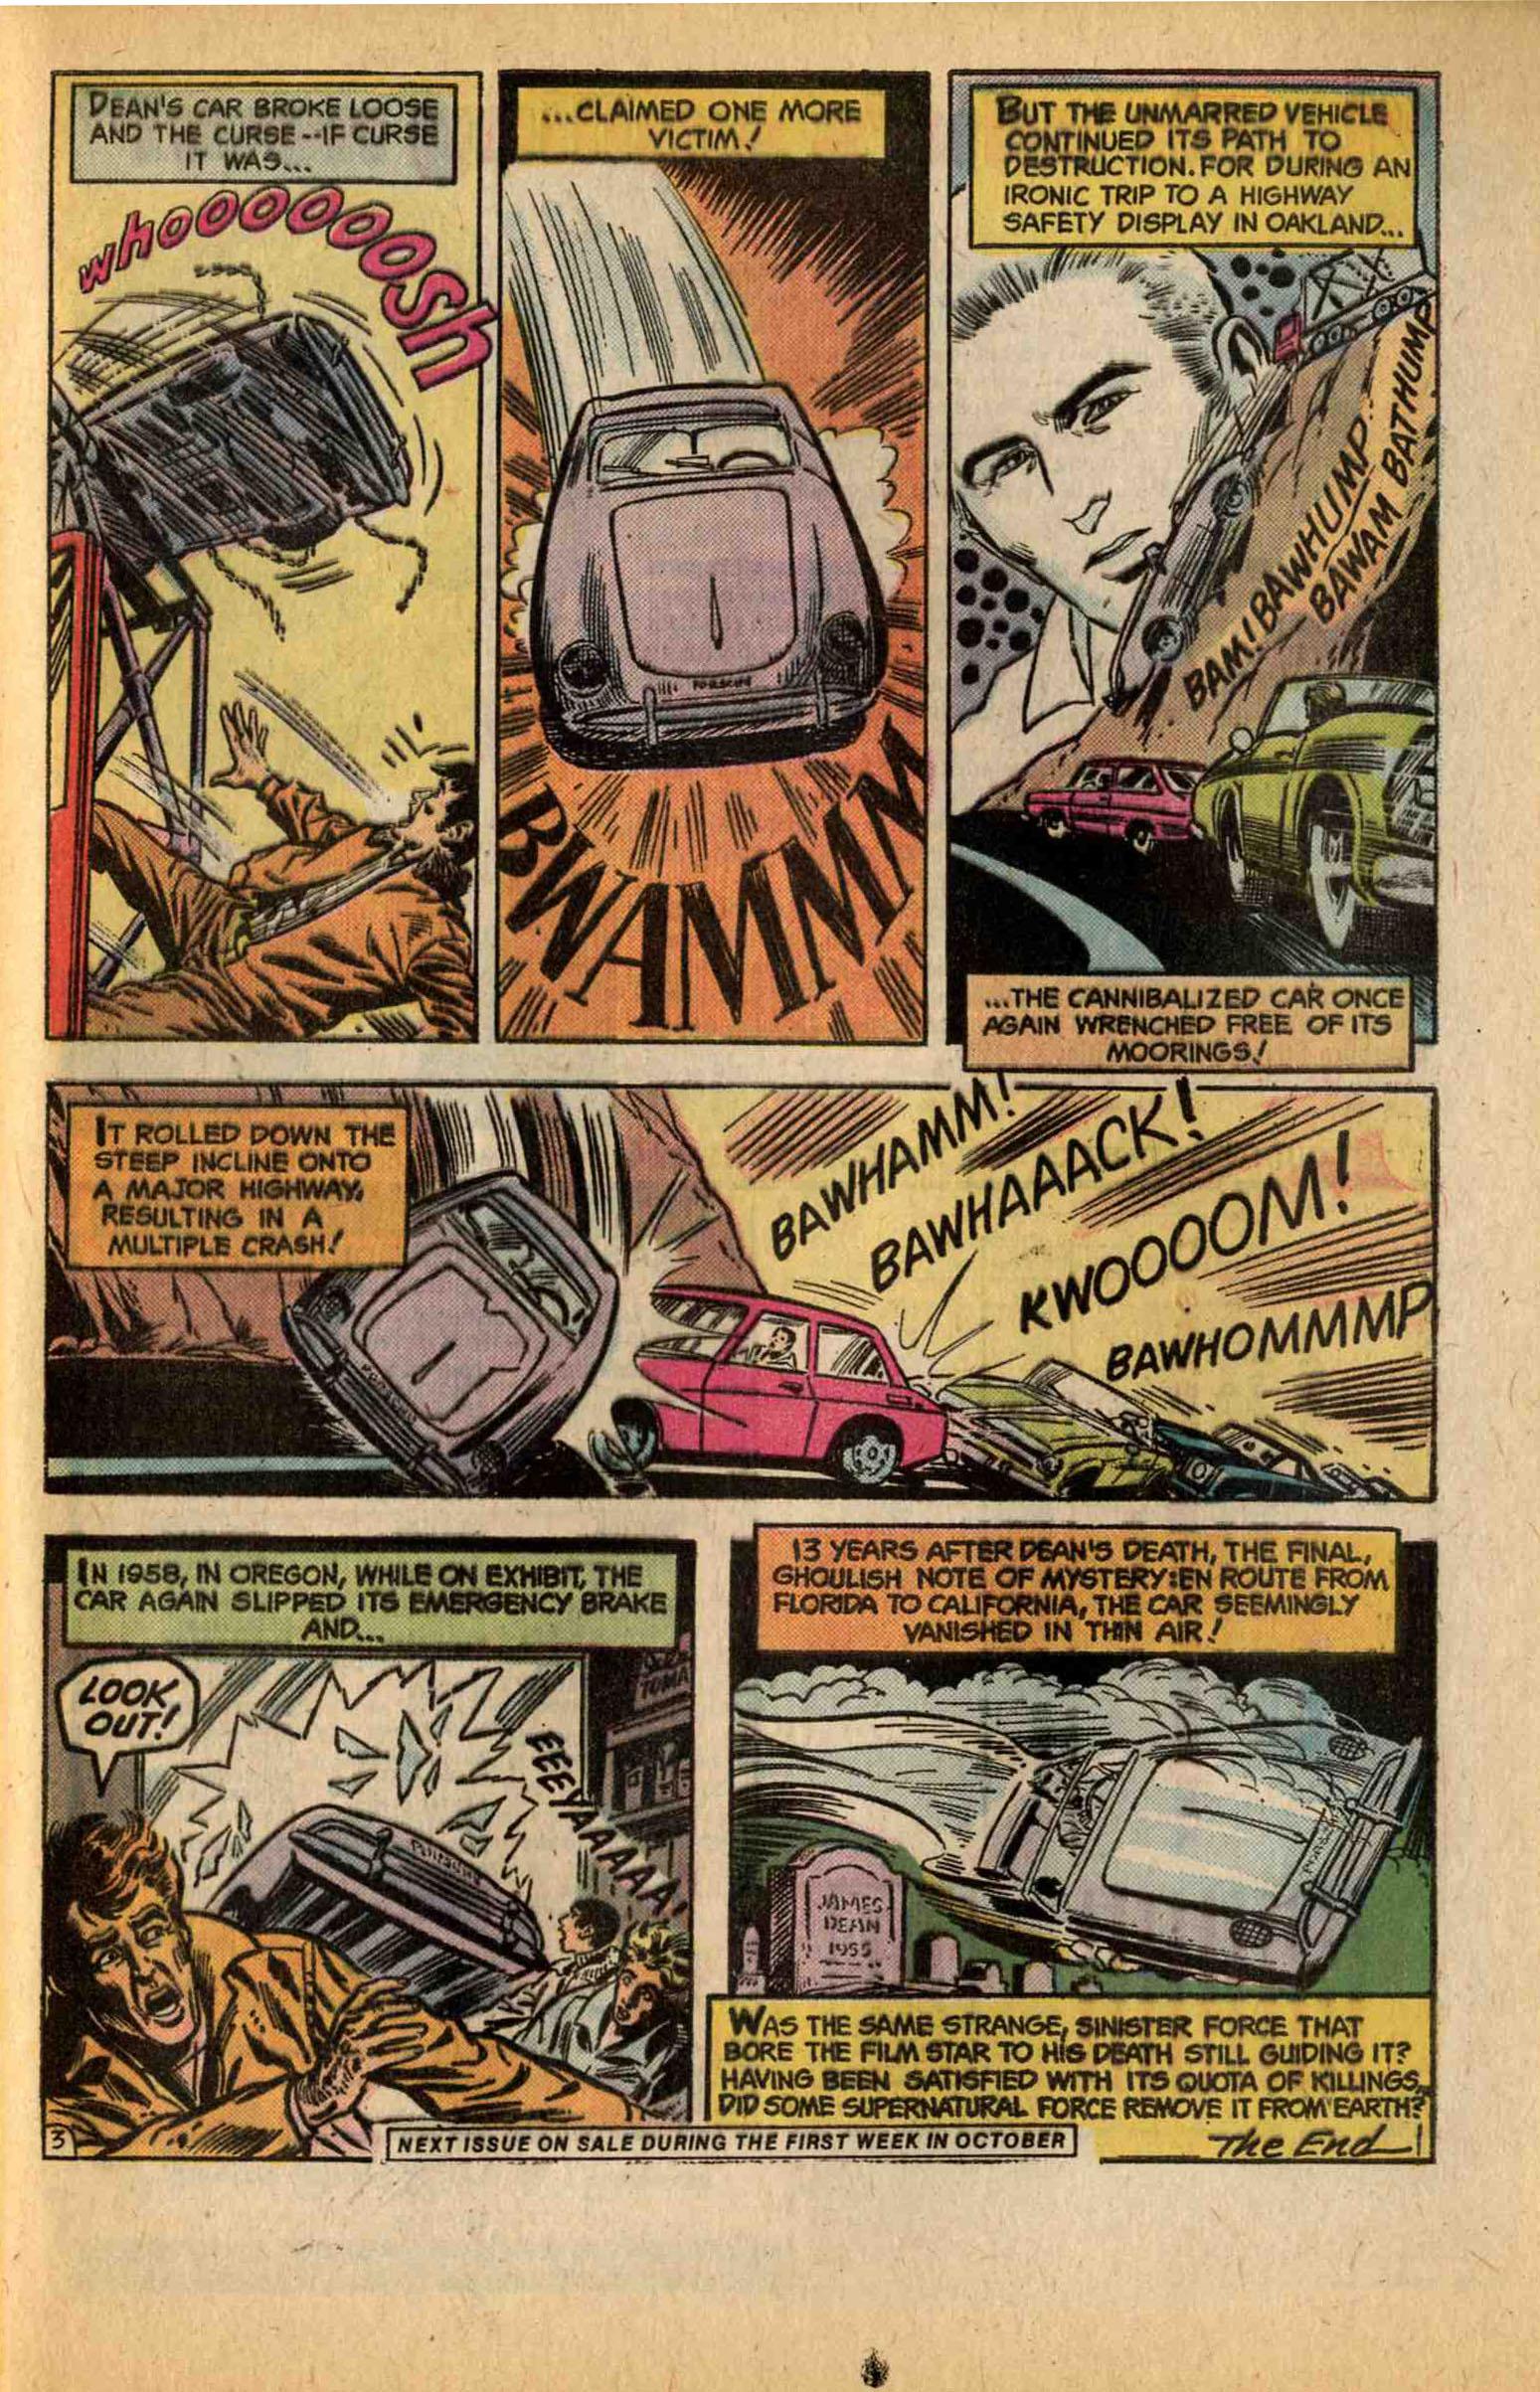 Ghosts (1971) #44 pg30, art by John Calnan.